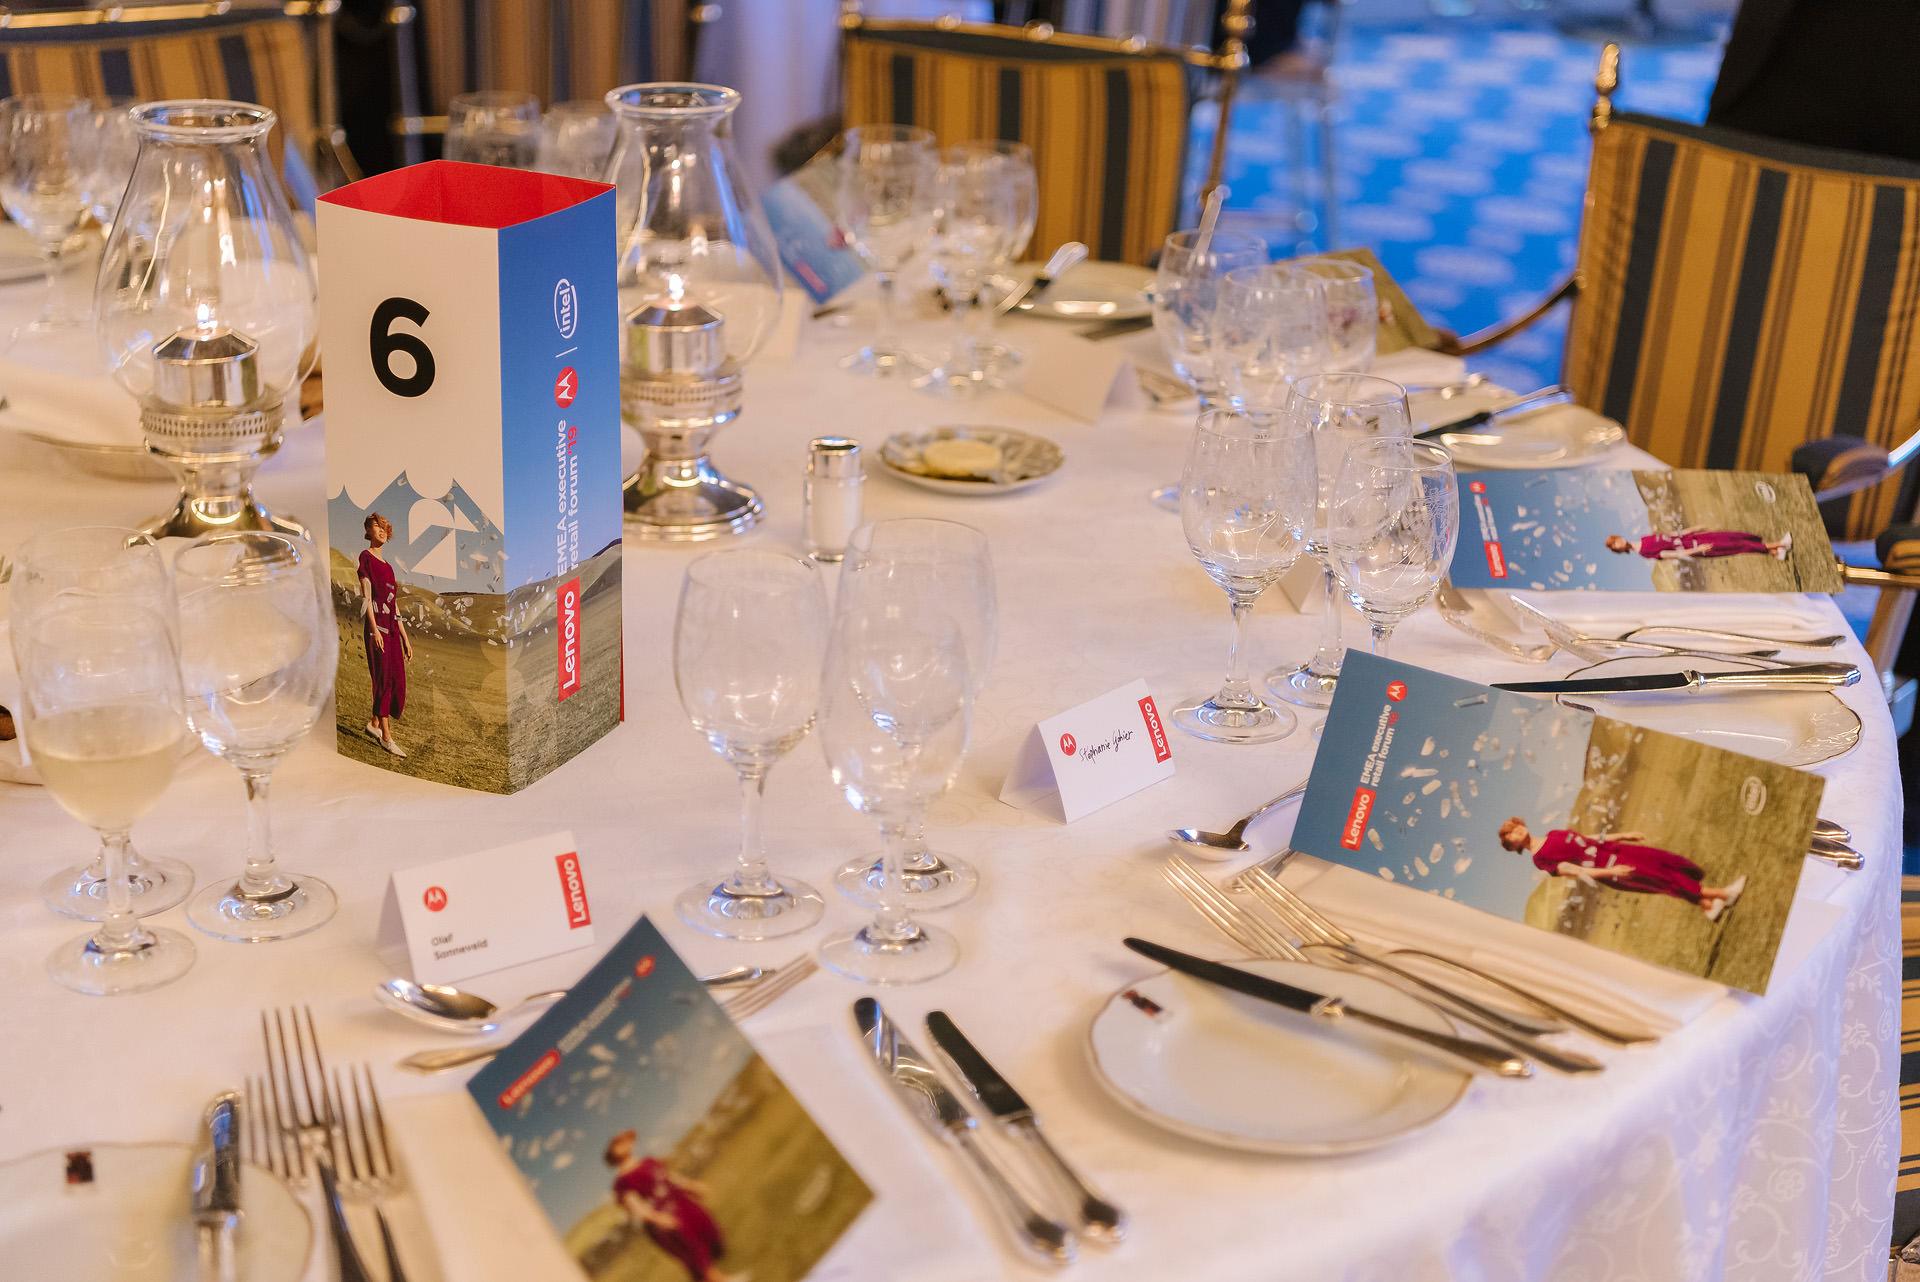 emea-executive-retail-forum-gruppo-peroni-eventi-07